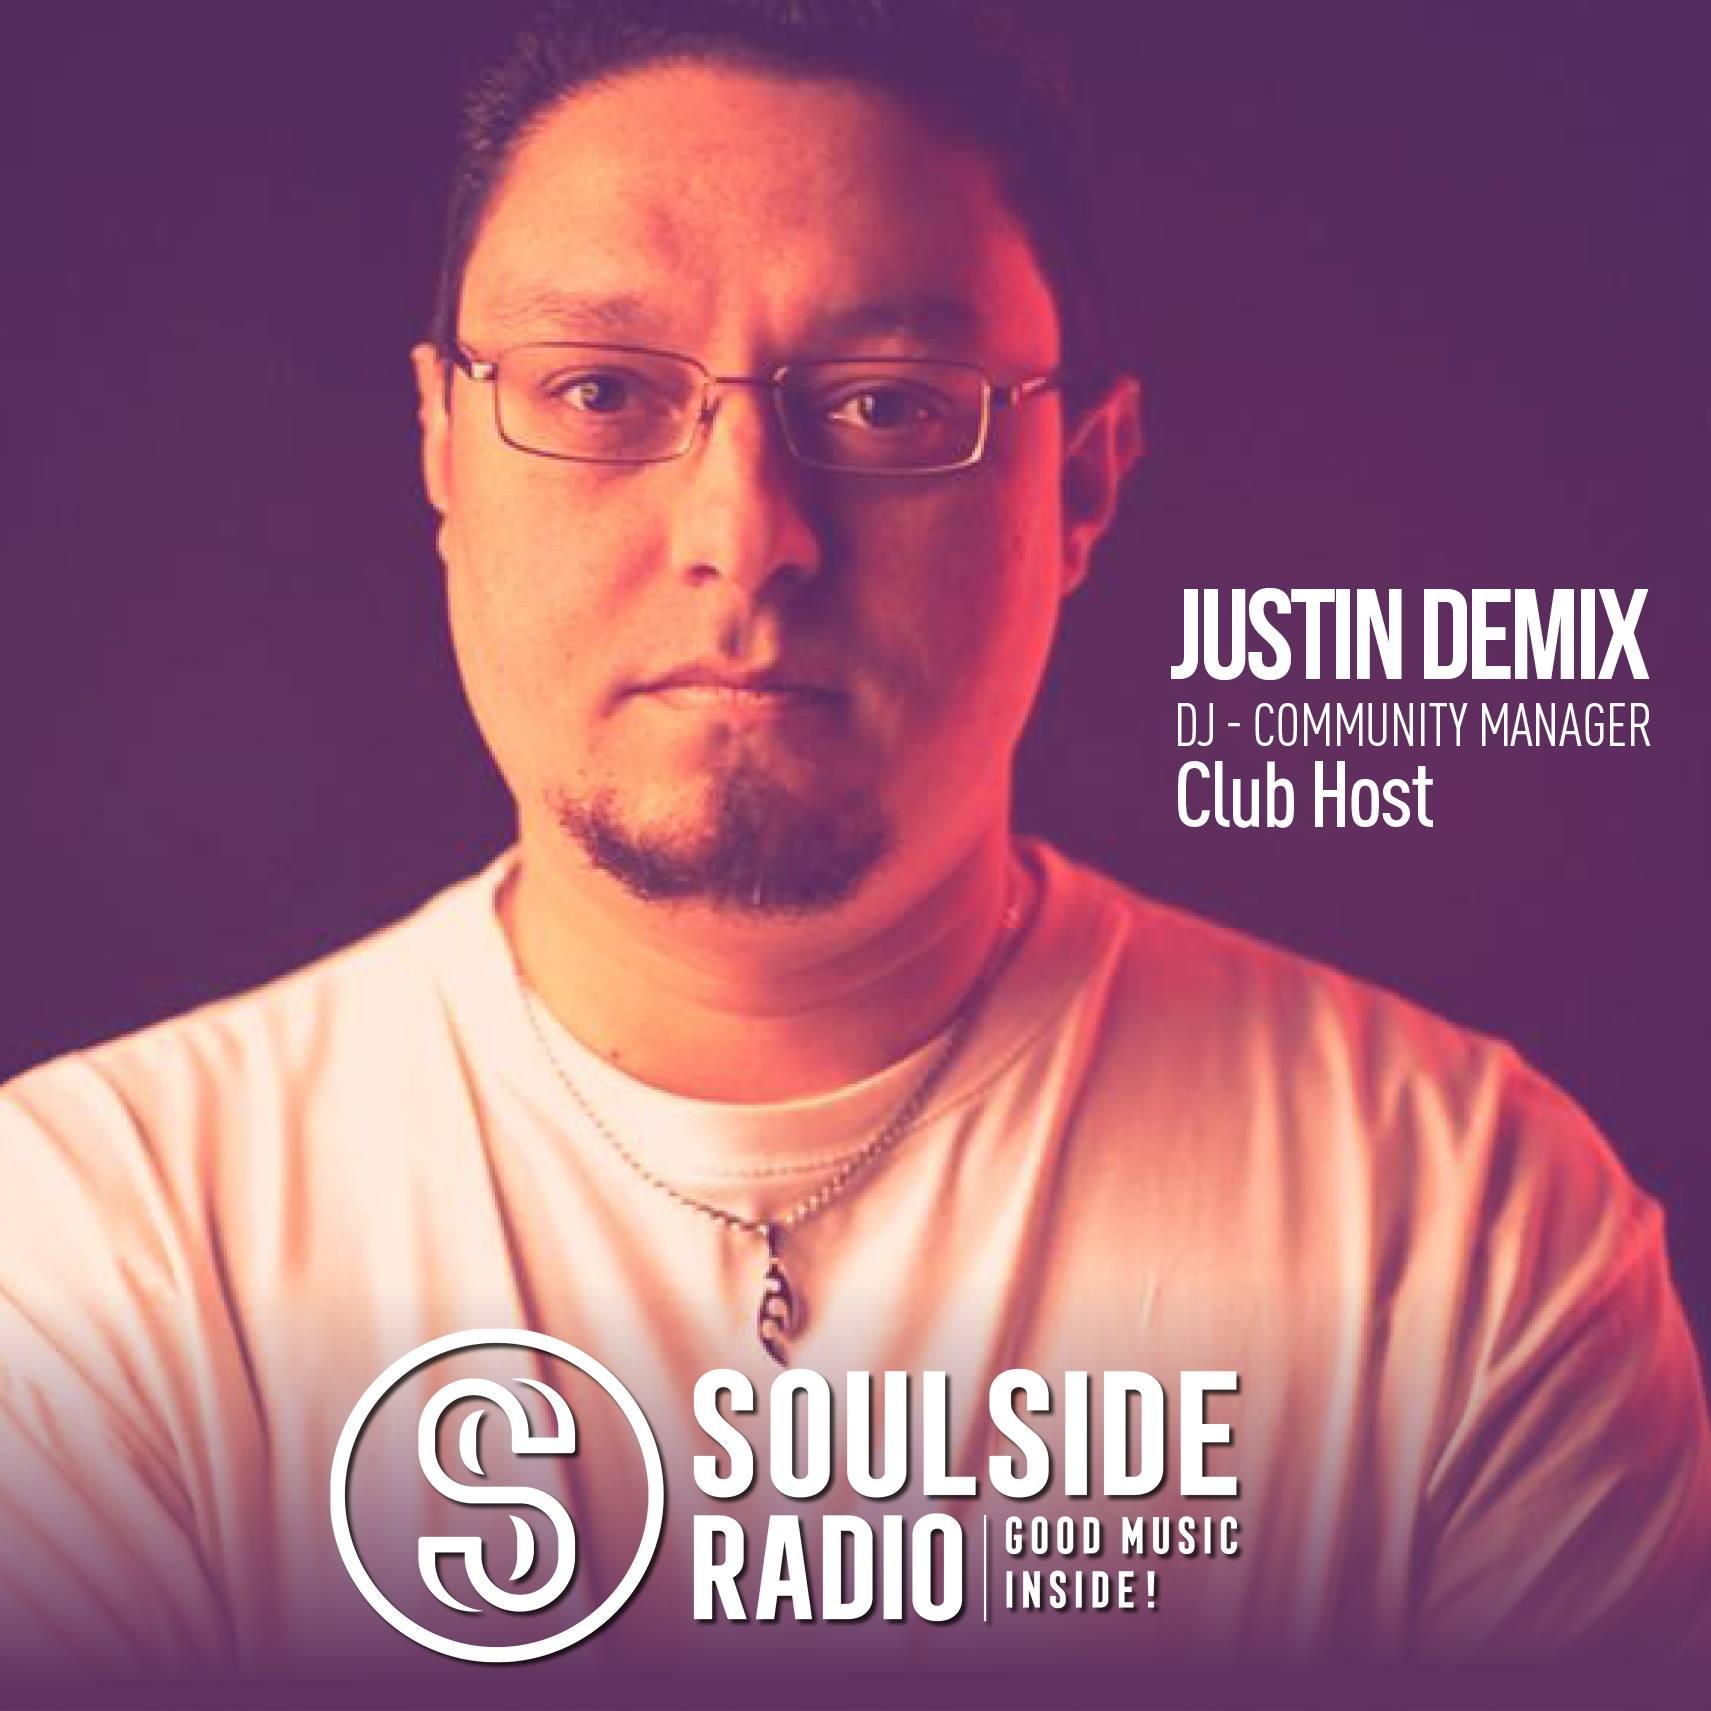 Justin Demix